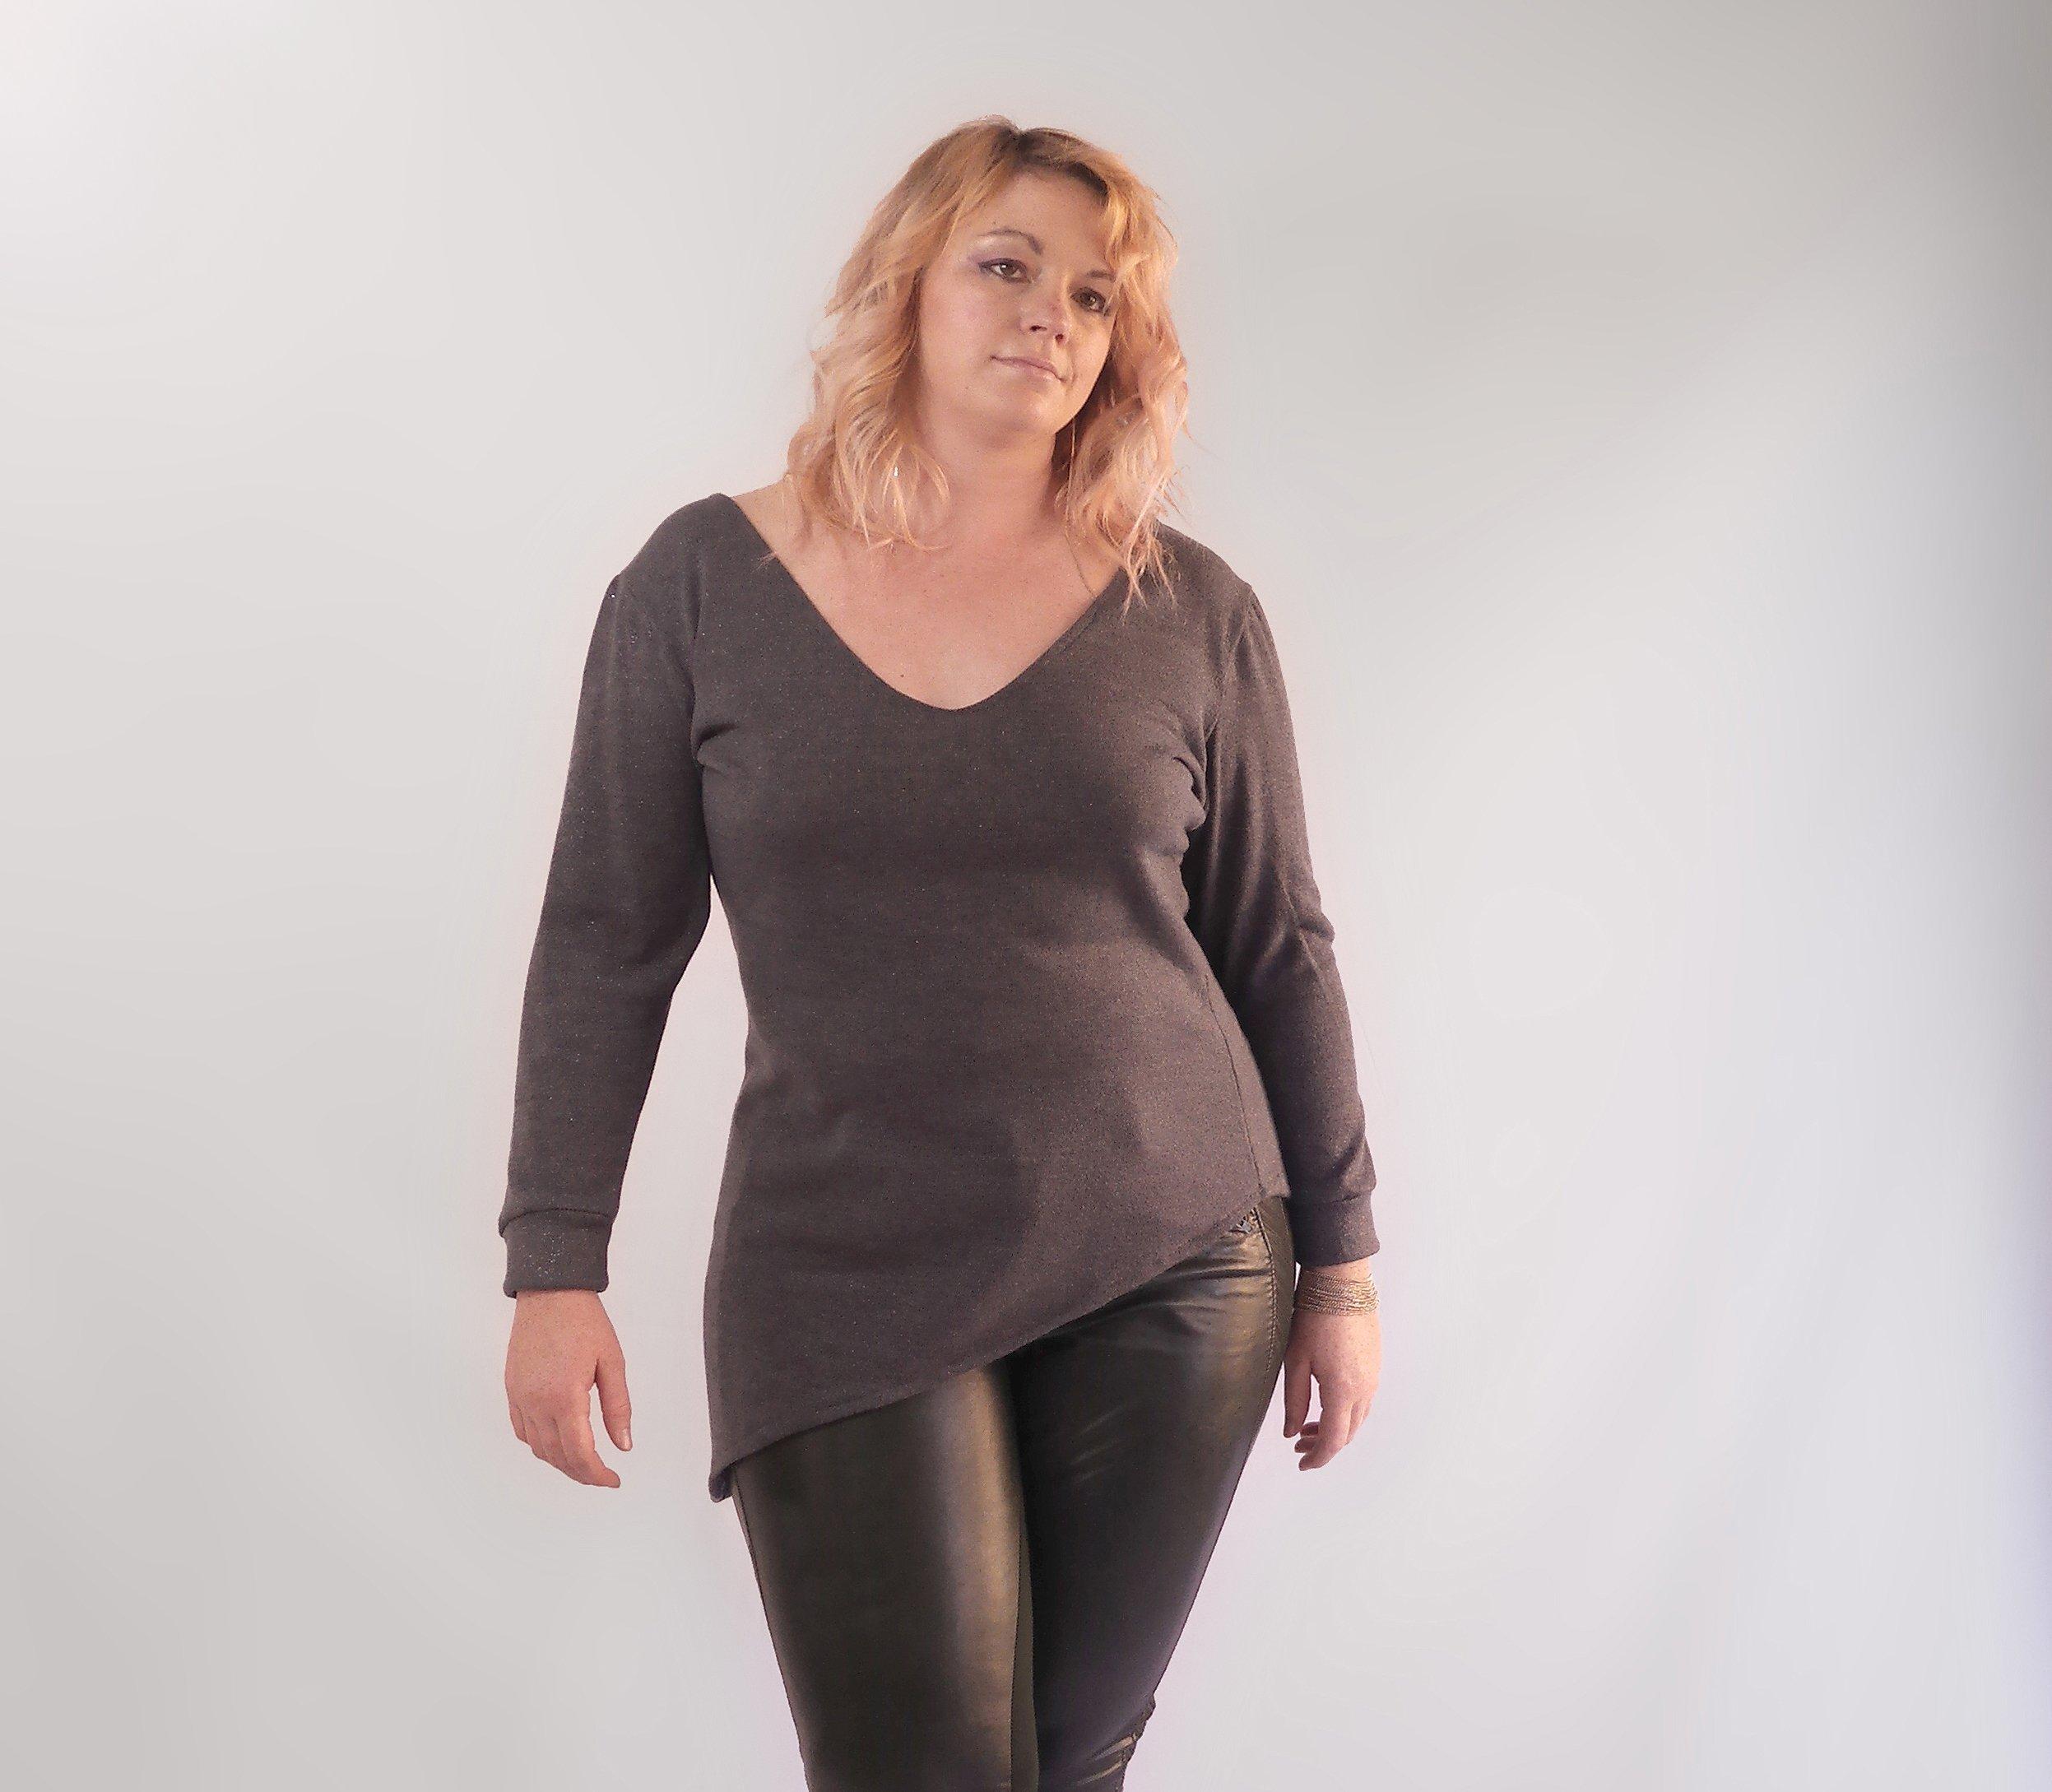 Asymmetric Dark Slate Metallic Tunic Top, Plus Size Knit Top, Dark Grey V-Neck Top, Night Out Top, Sparkly Soft Warm Sweater. Size ML-XL by Kimonology